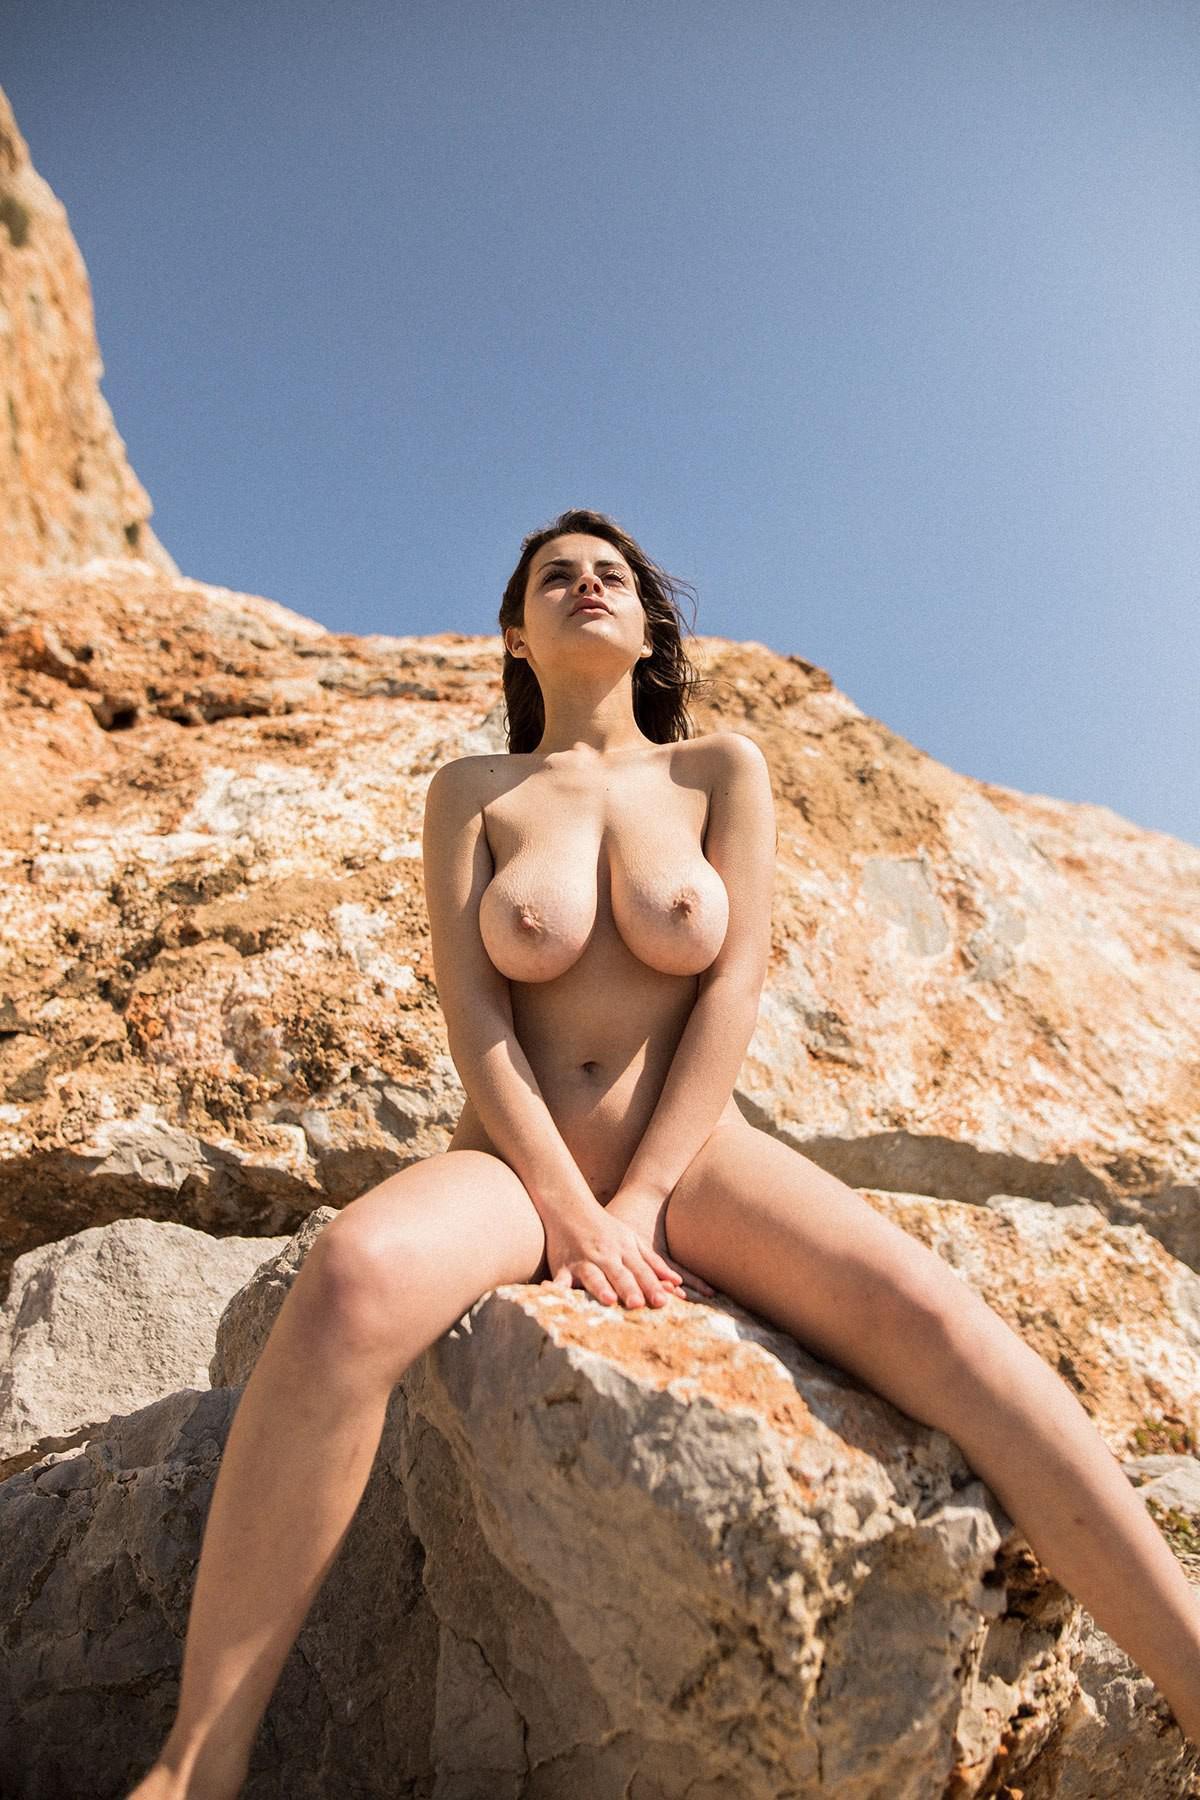 bouncing boobs nude fucking